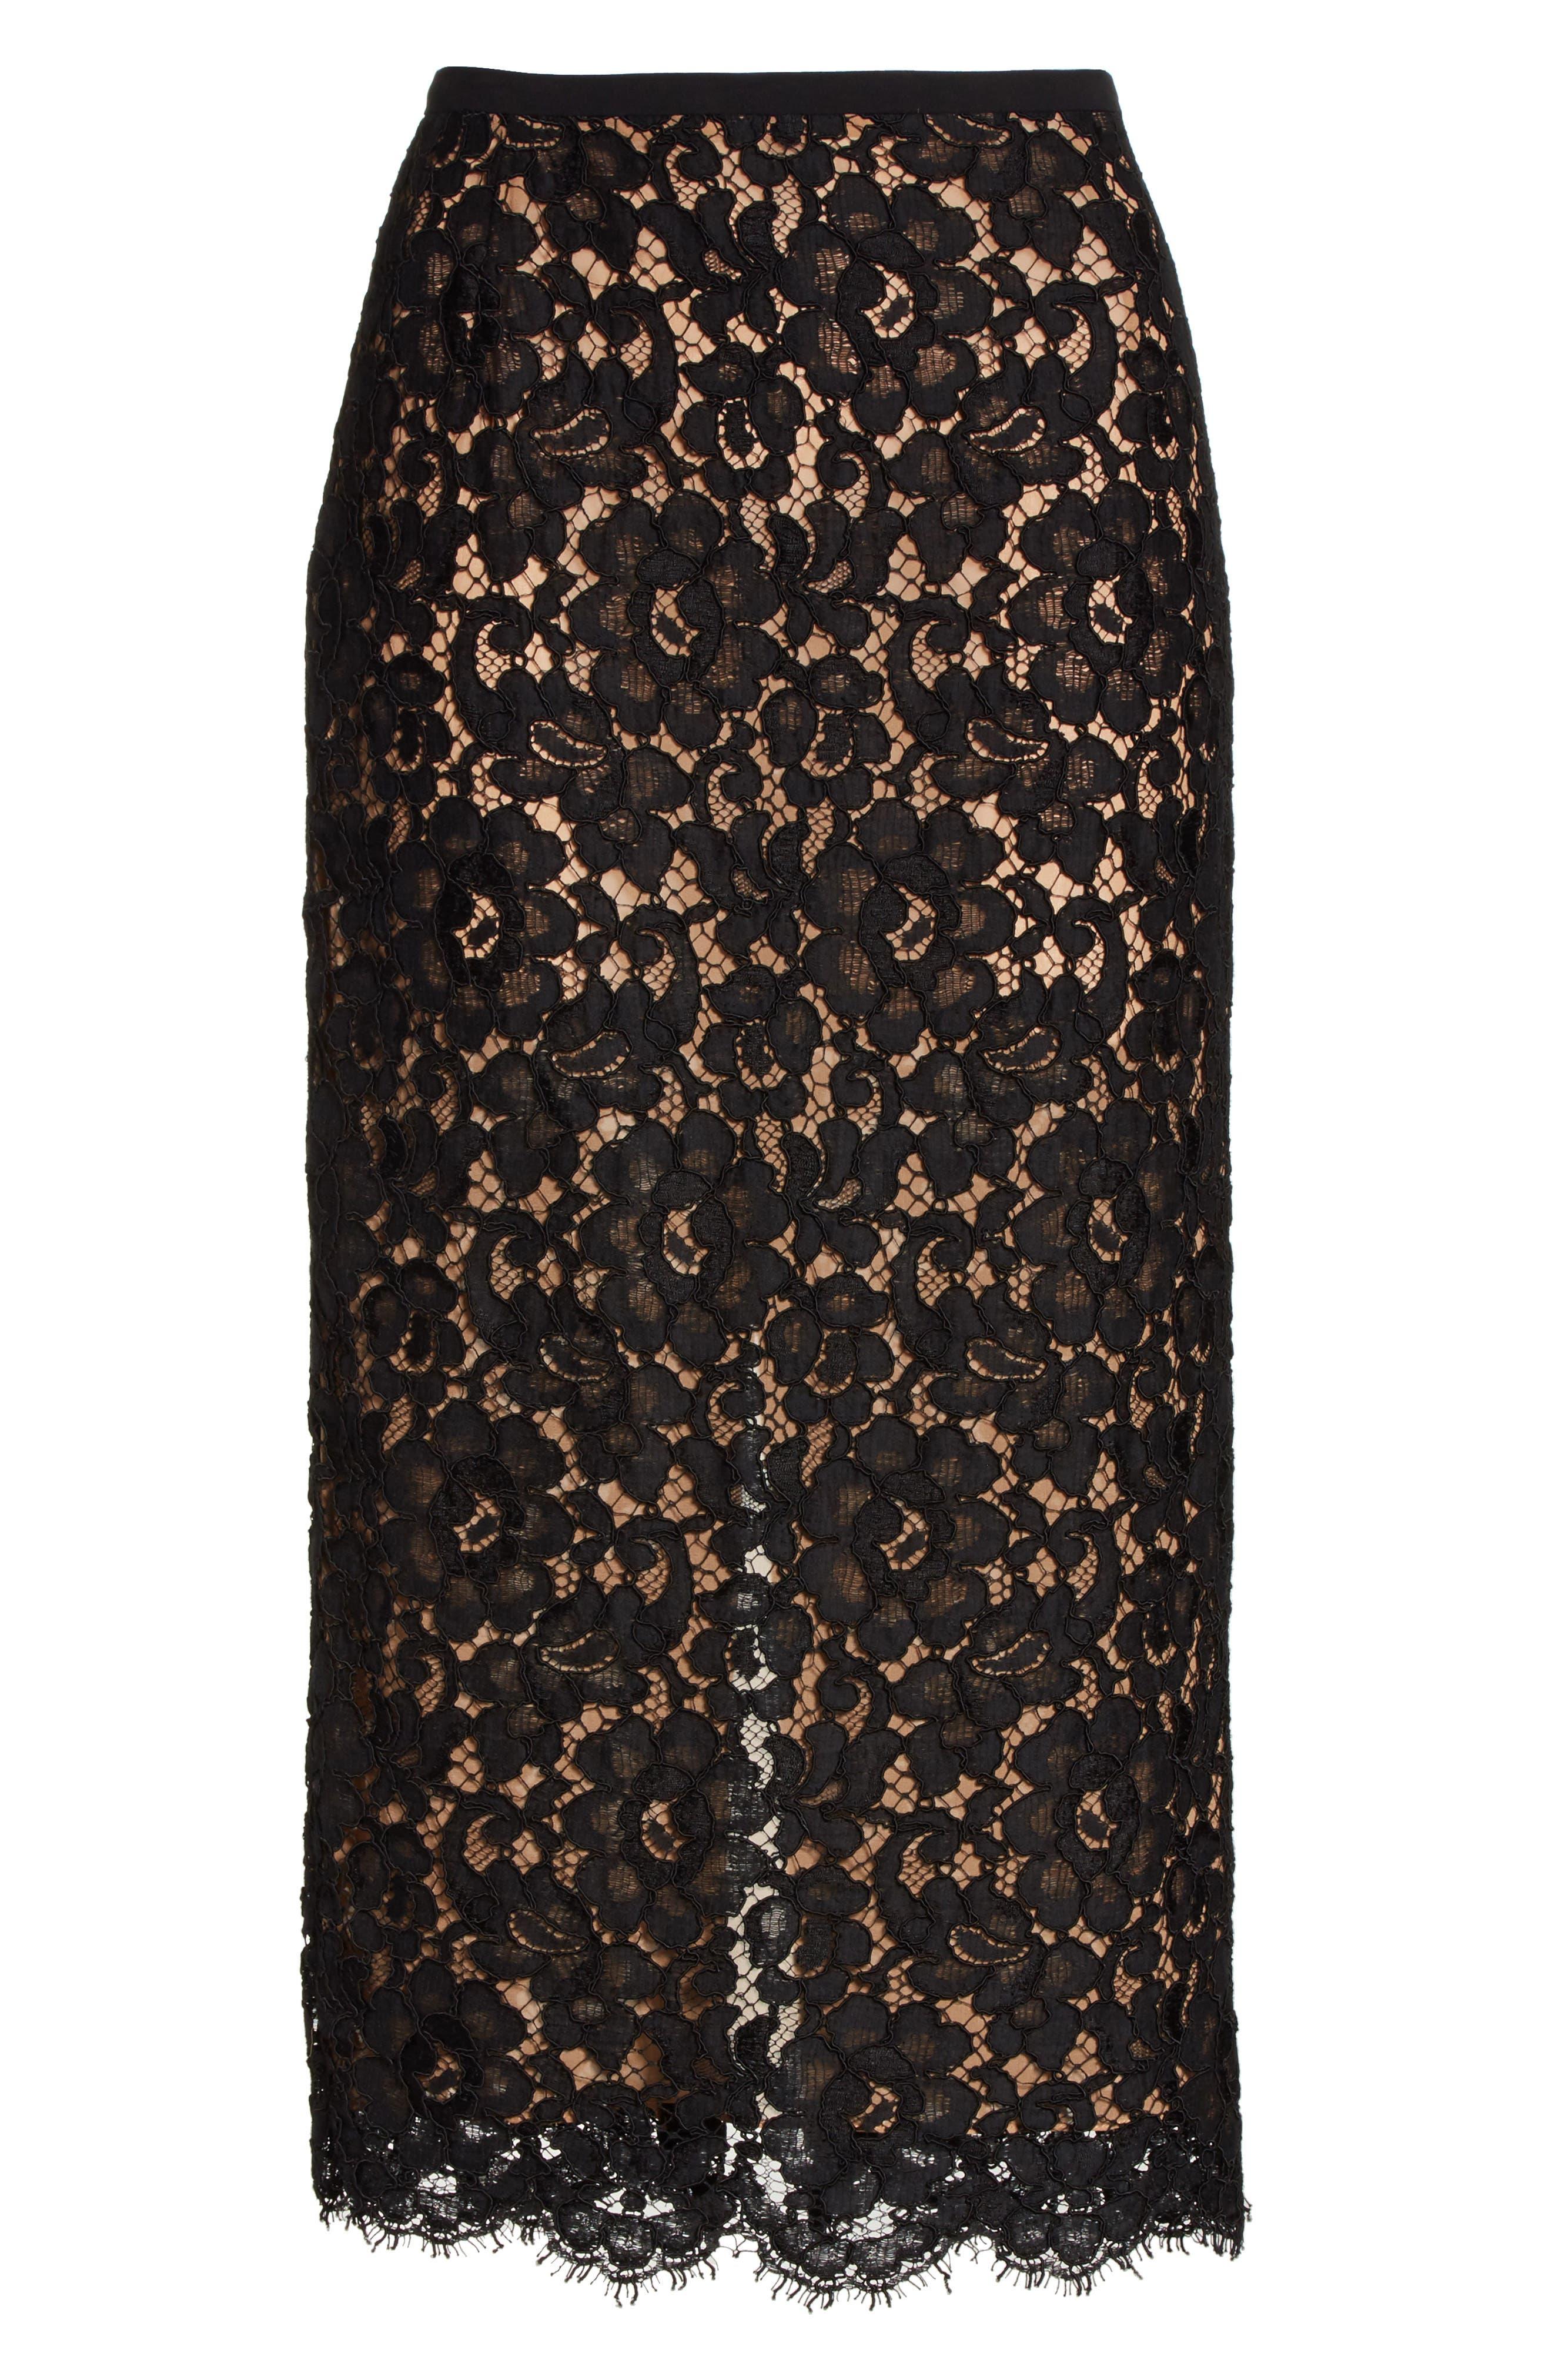 Lace Pencil Skirt,                             Alternate thumbnail 6, color,                             BLACK